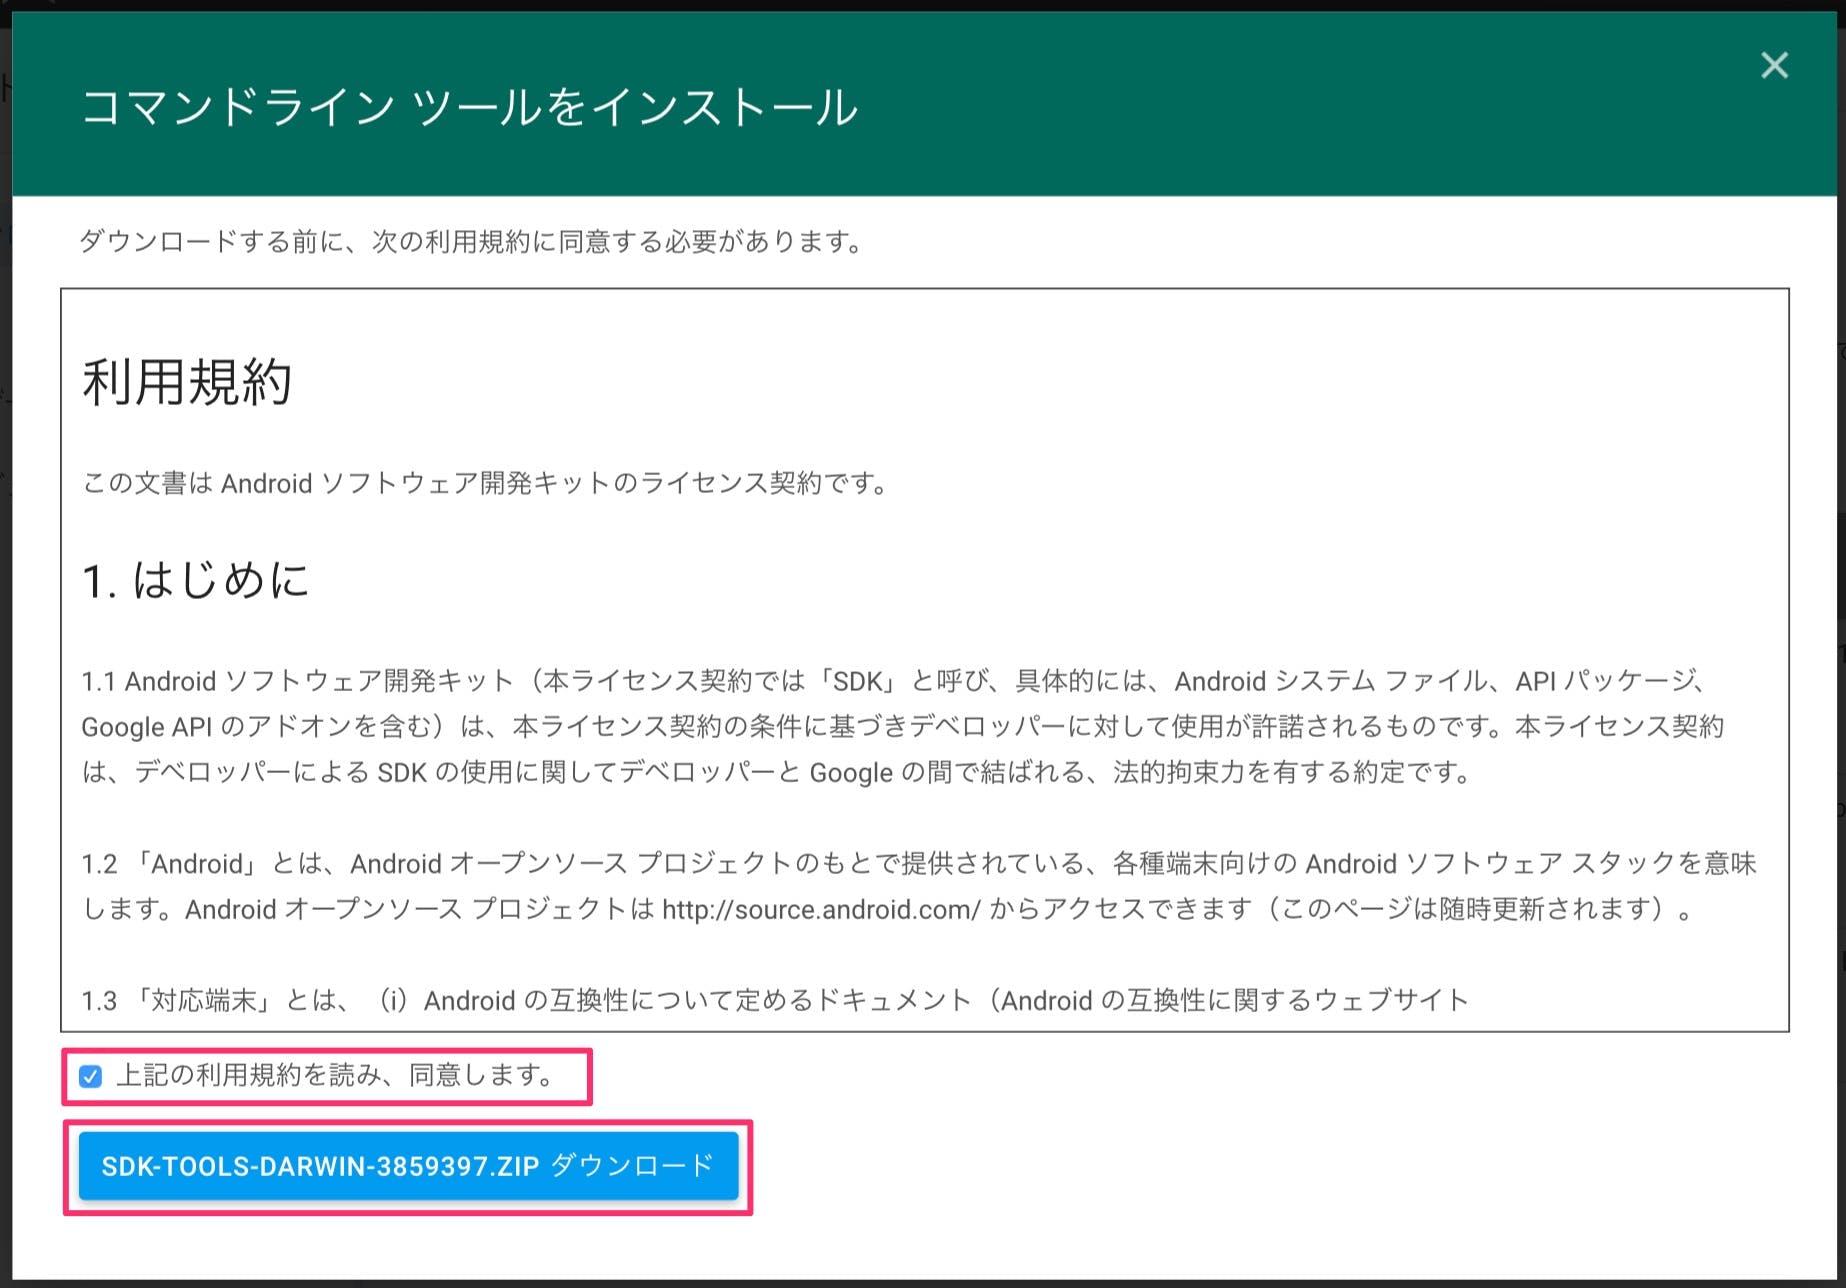 Android Studioを入れずにAndroid SDKをインストールする方法(Mac) - Qiita